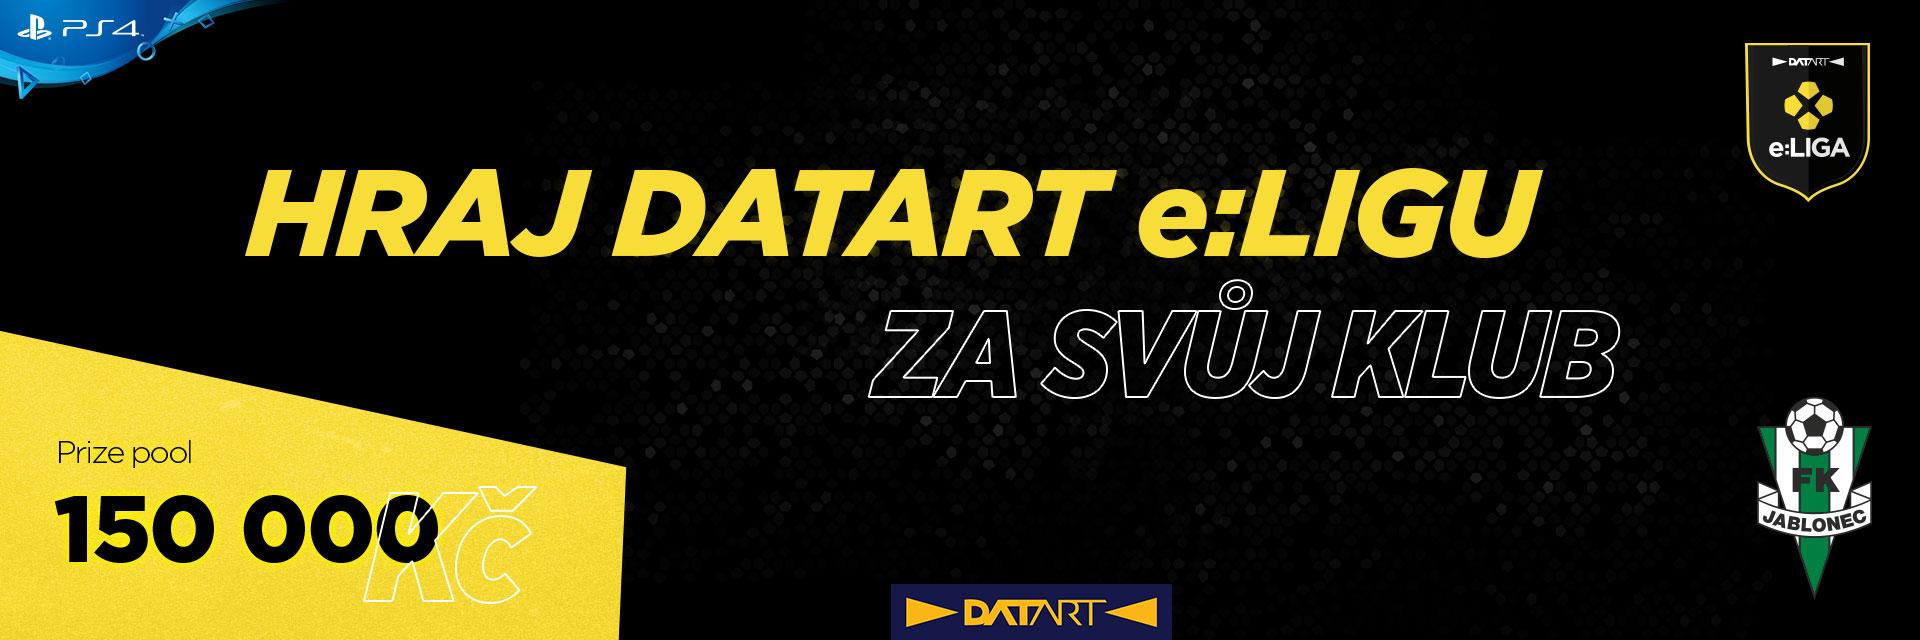 datart-e-liga-semifinale-fk-jablonec